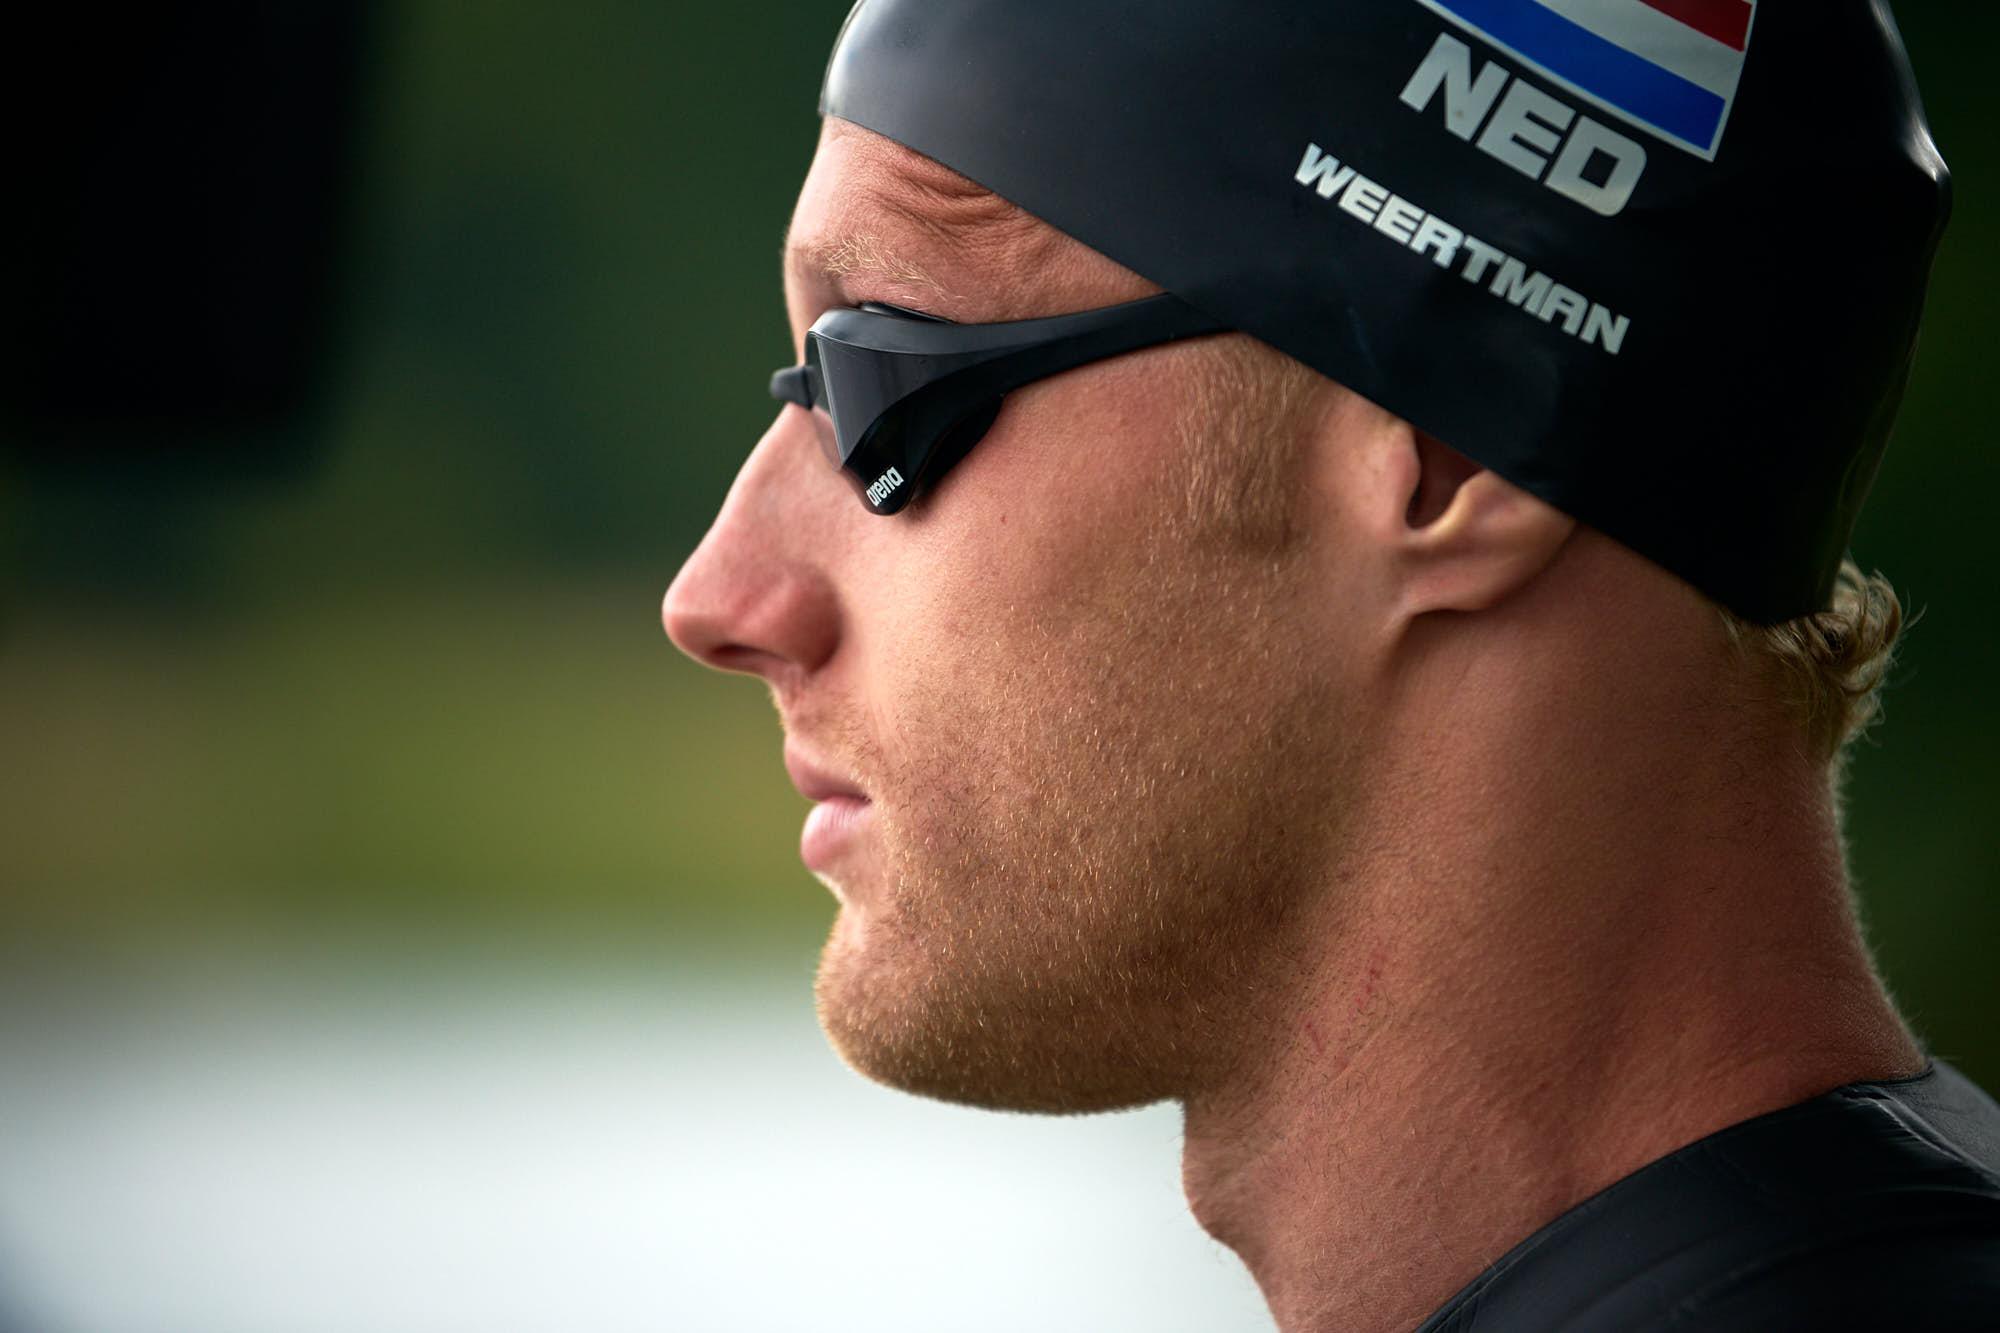 Focus on face of Ferry Weertman